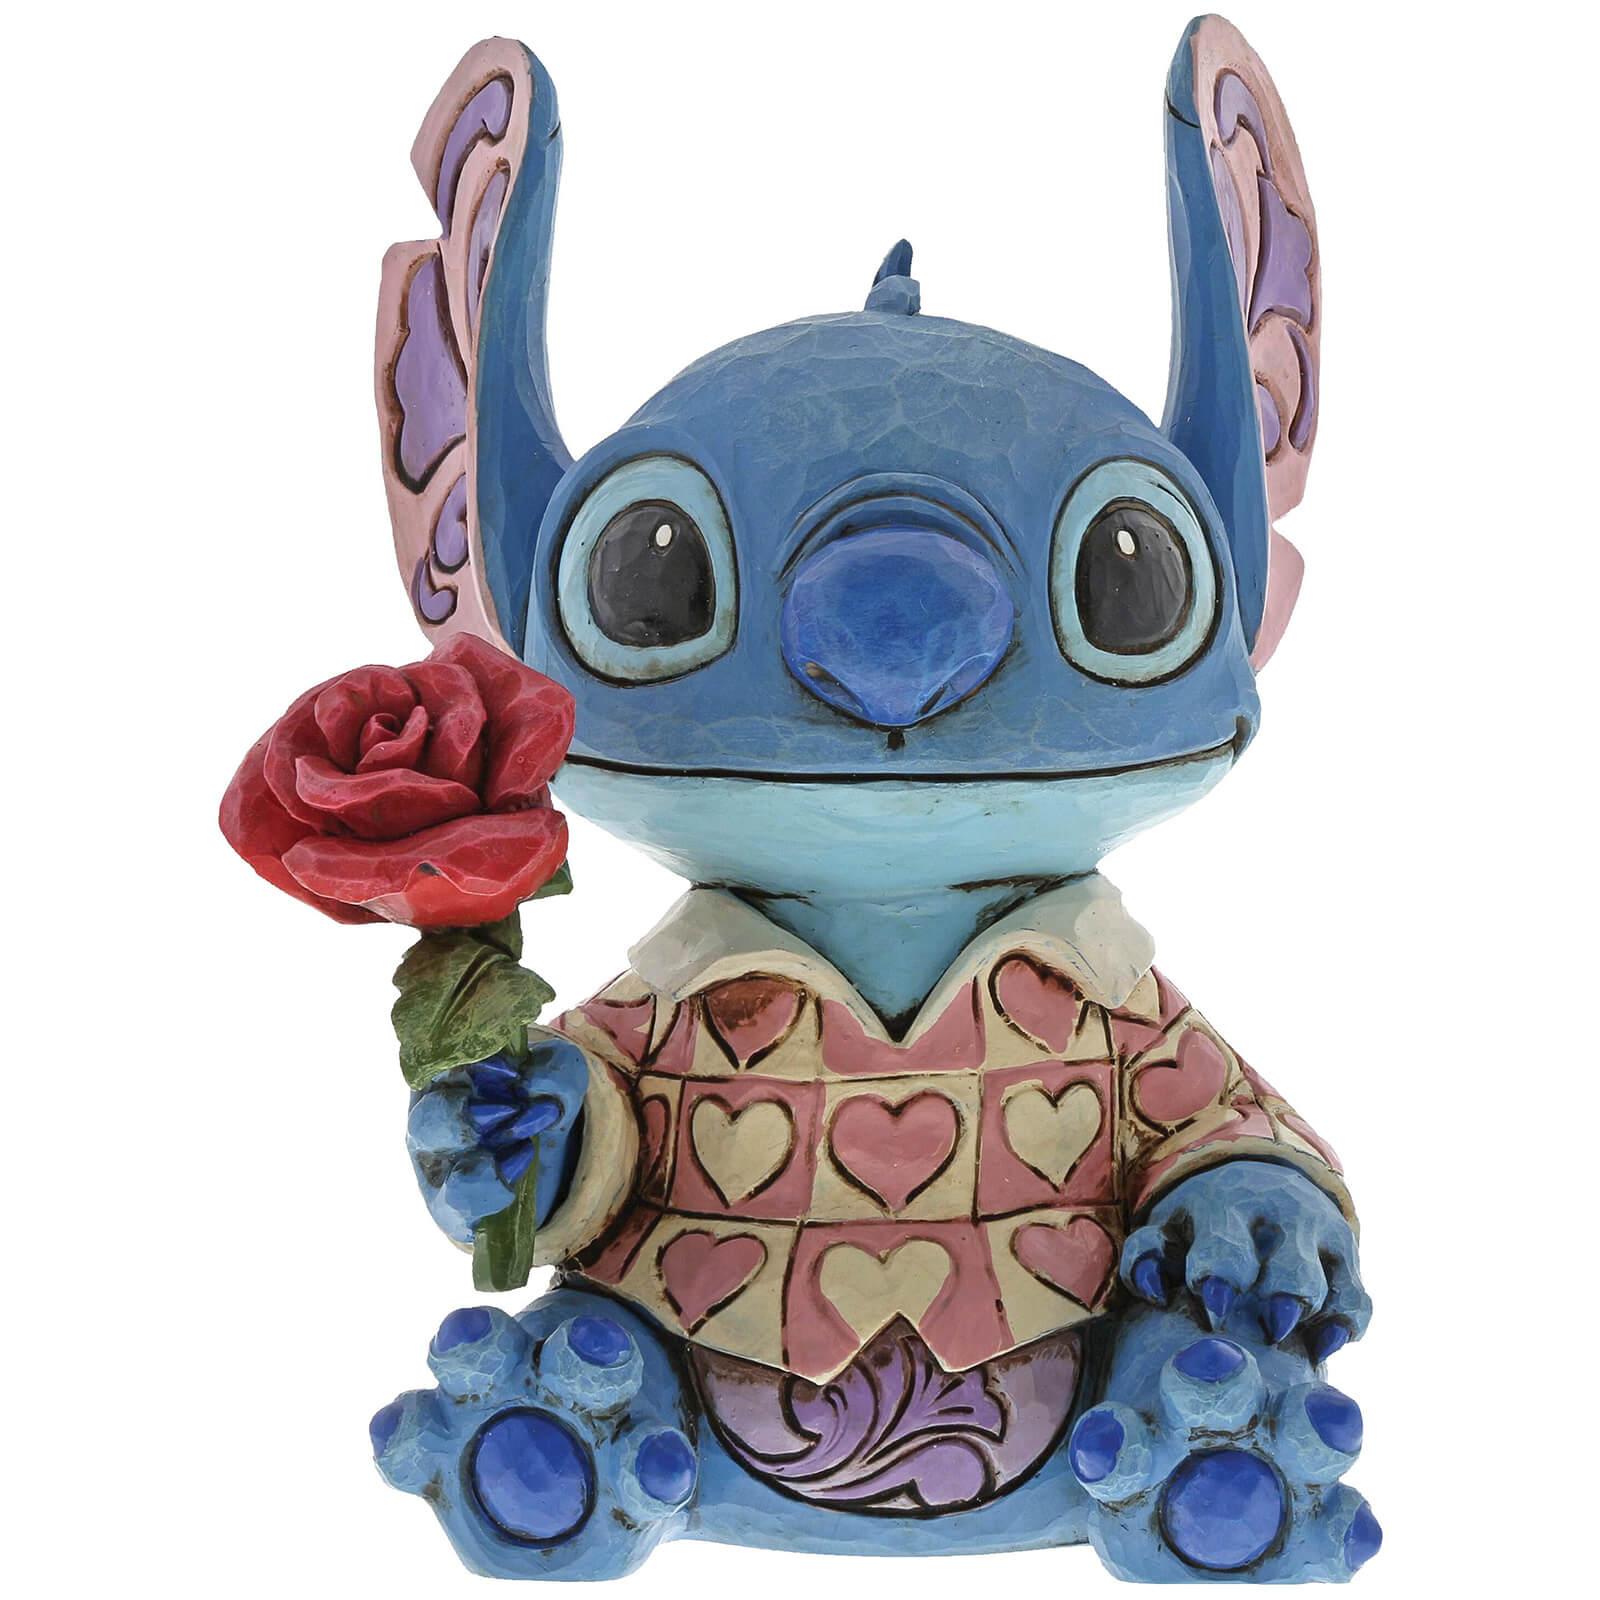 Disney Traditions Clueless Casanova (Stitch Figurine) 9.0cm